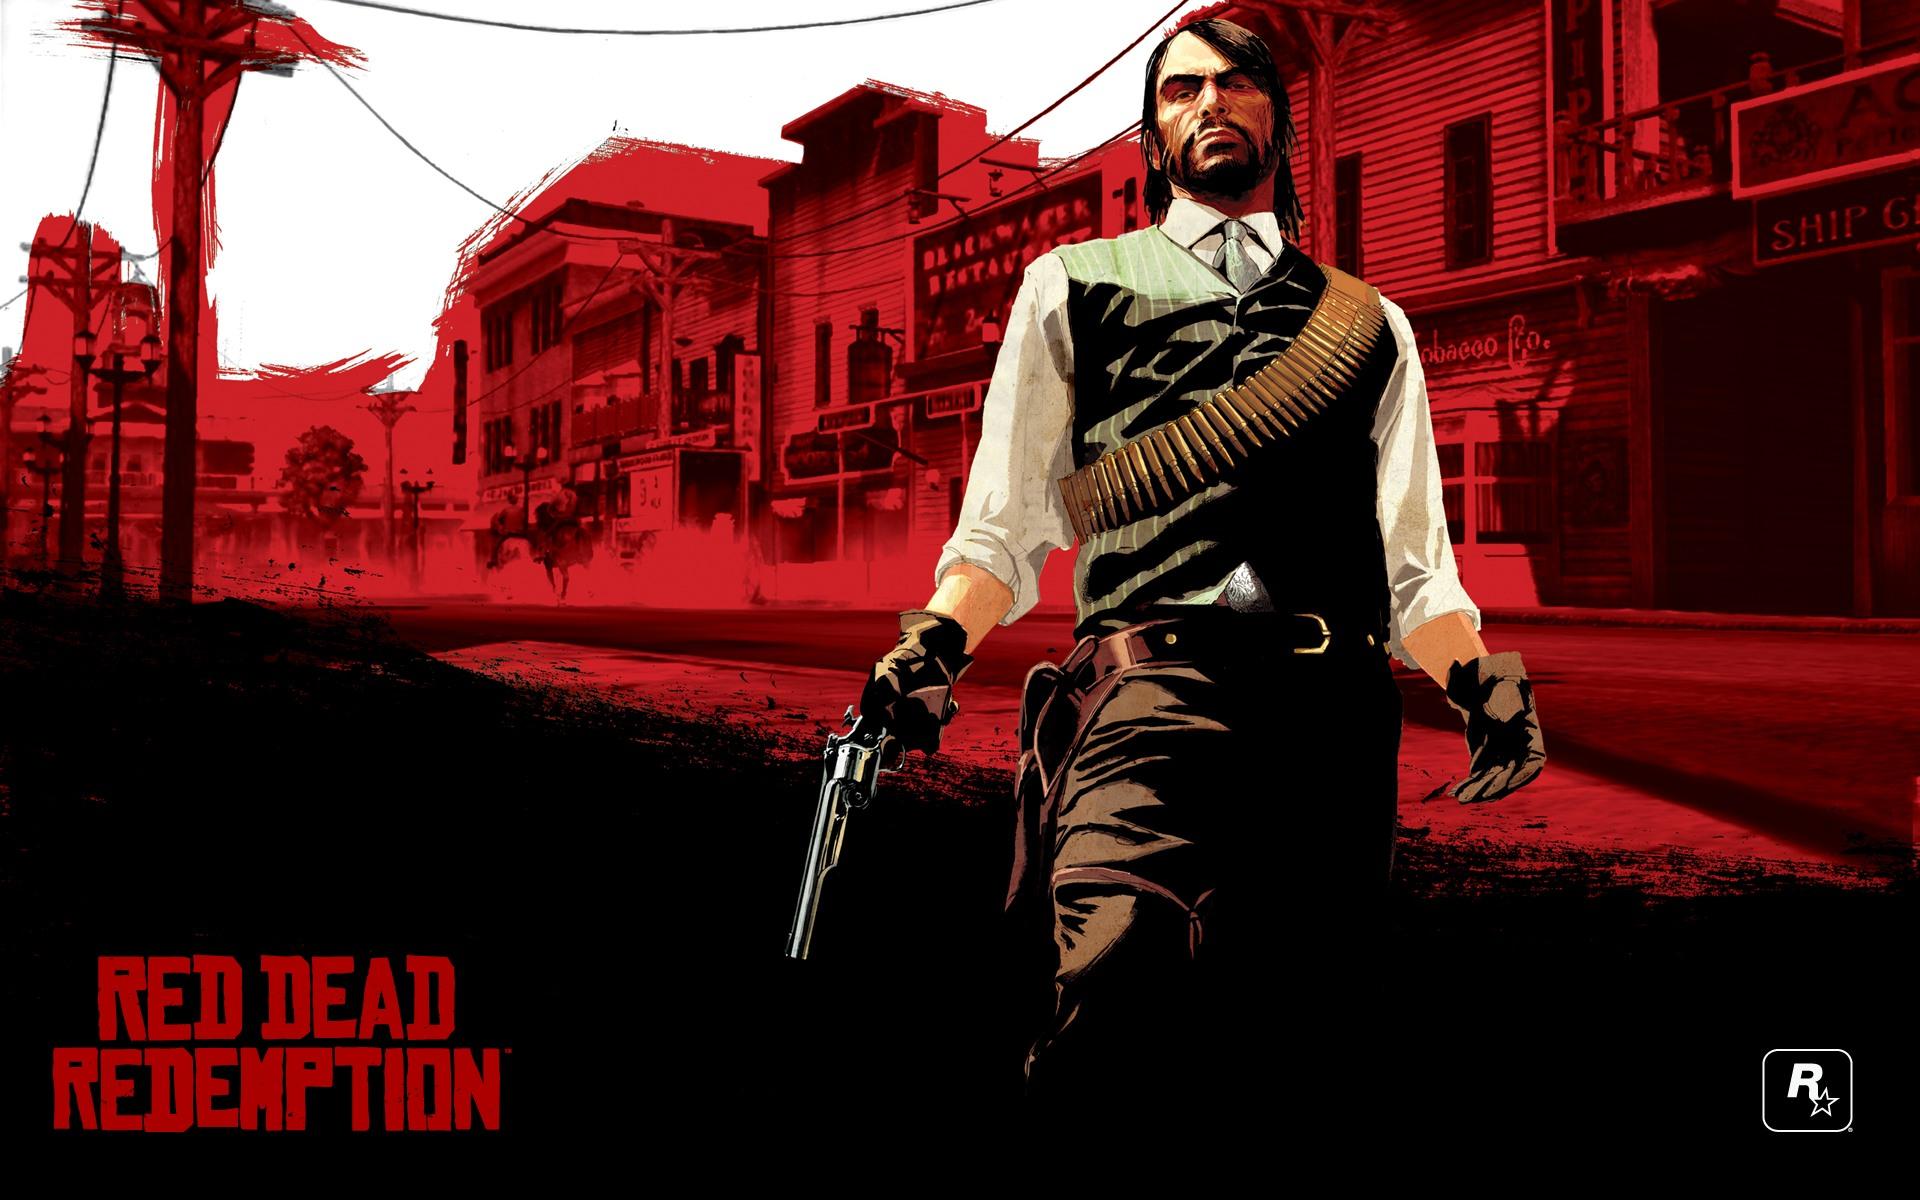 Free Download Red Dead Redemption Desktop Wallpaper 1920x1200